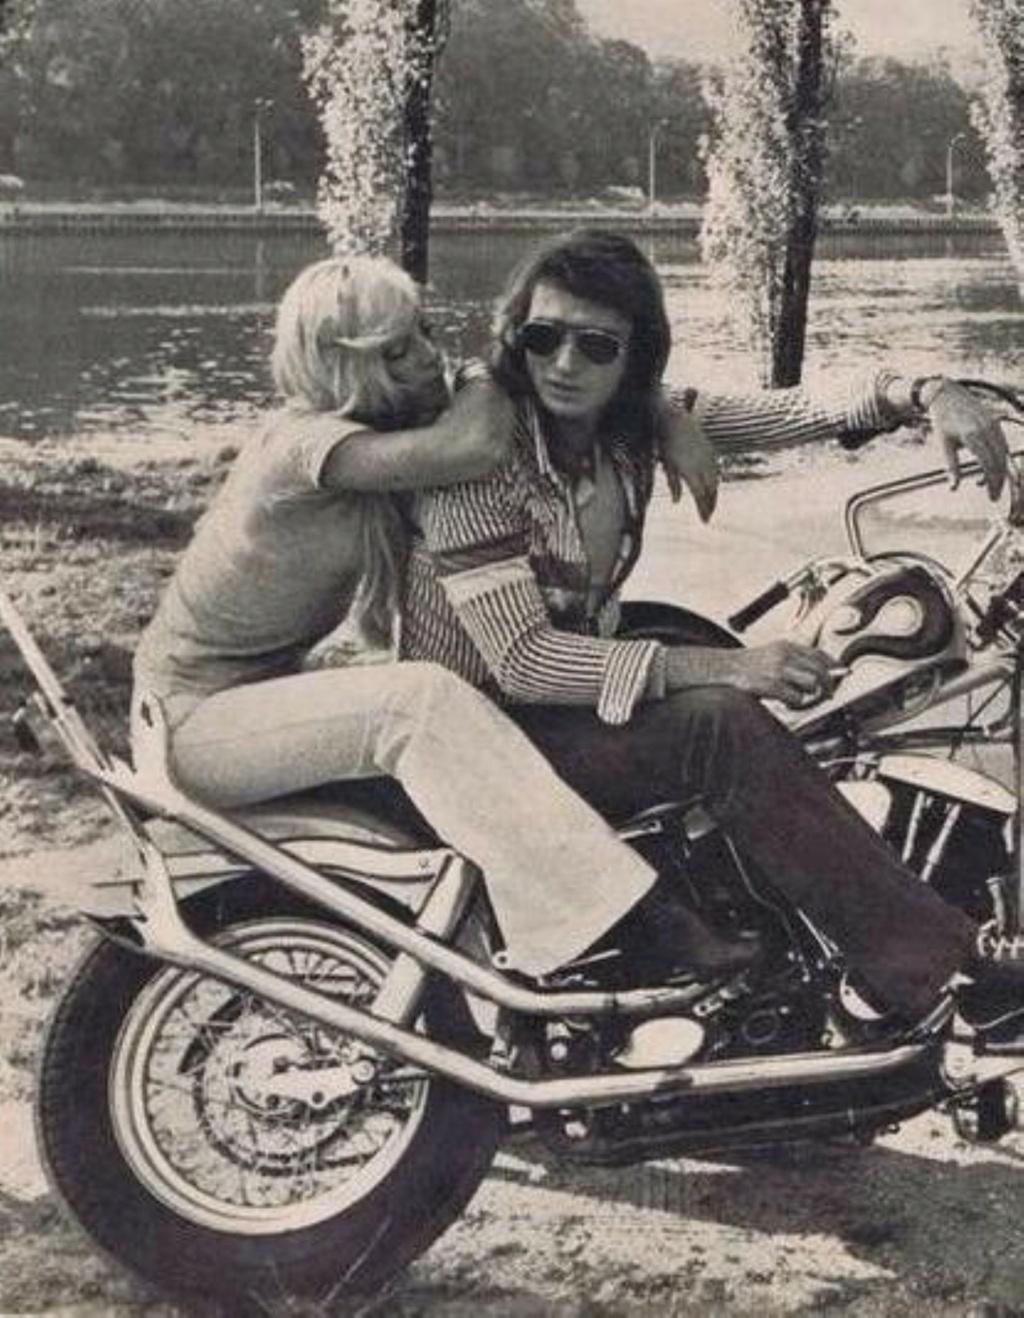 CHOPPER ( MOTEUR HARLEY SHOVELHEAD ) DE JOHNNY HALLYDAY ( 1971 ) 253d4a10